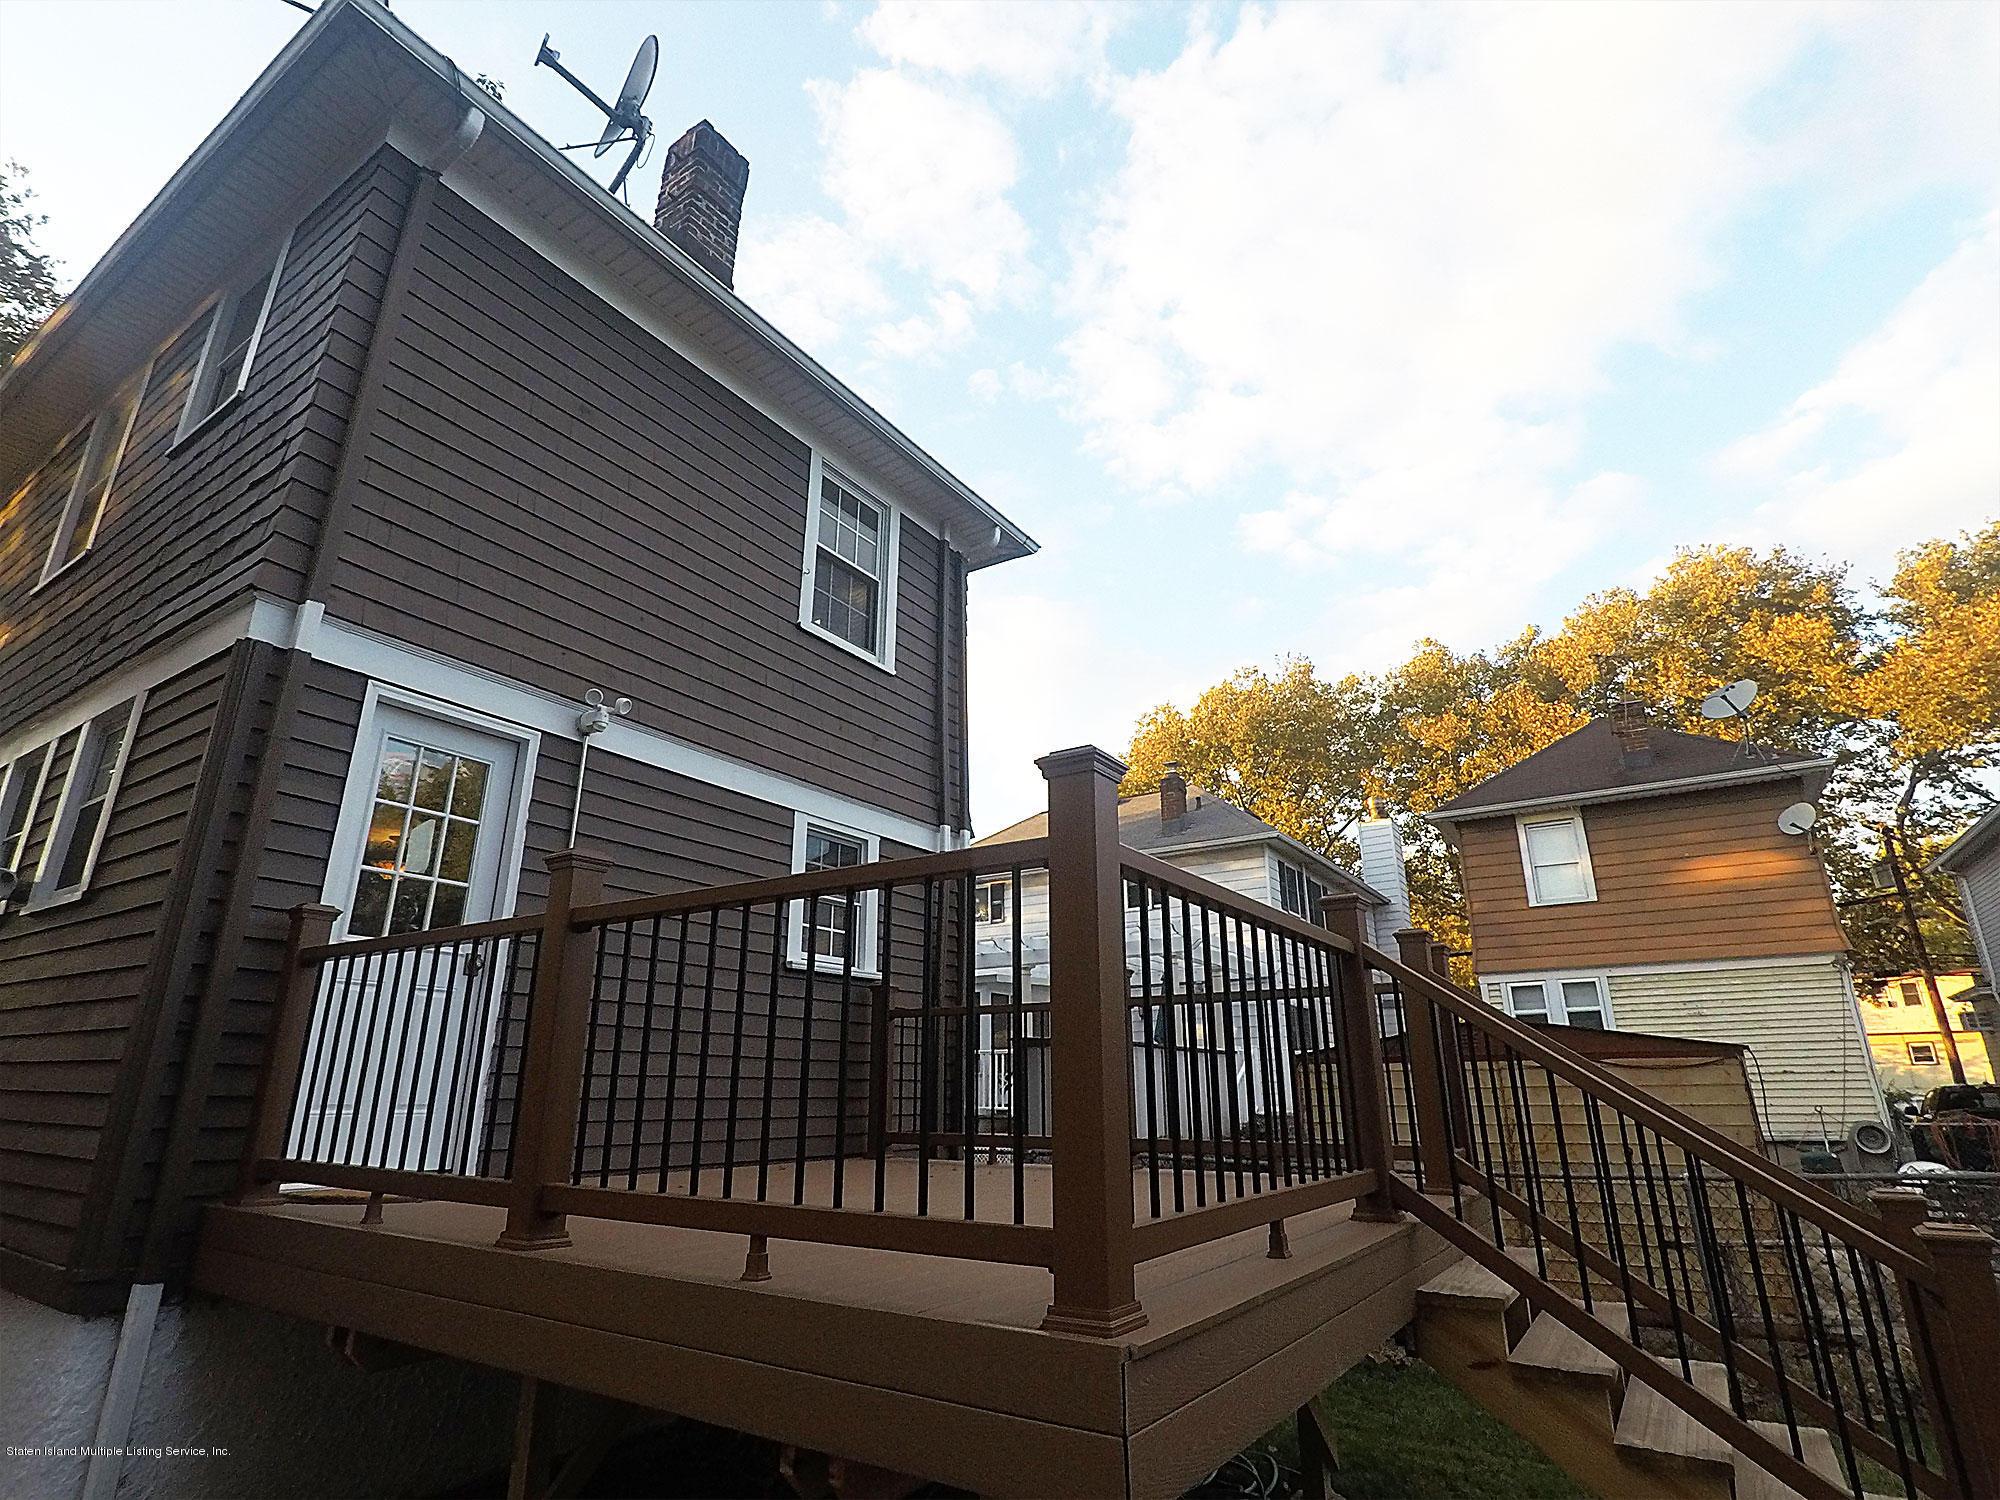 Single Family - Detached 115 Woodbine Avenue  Staten Island, NY 10314, MLS-1123689-40